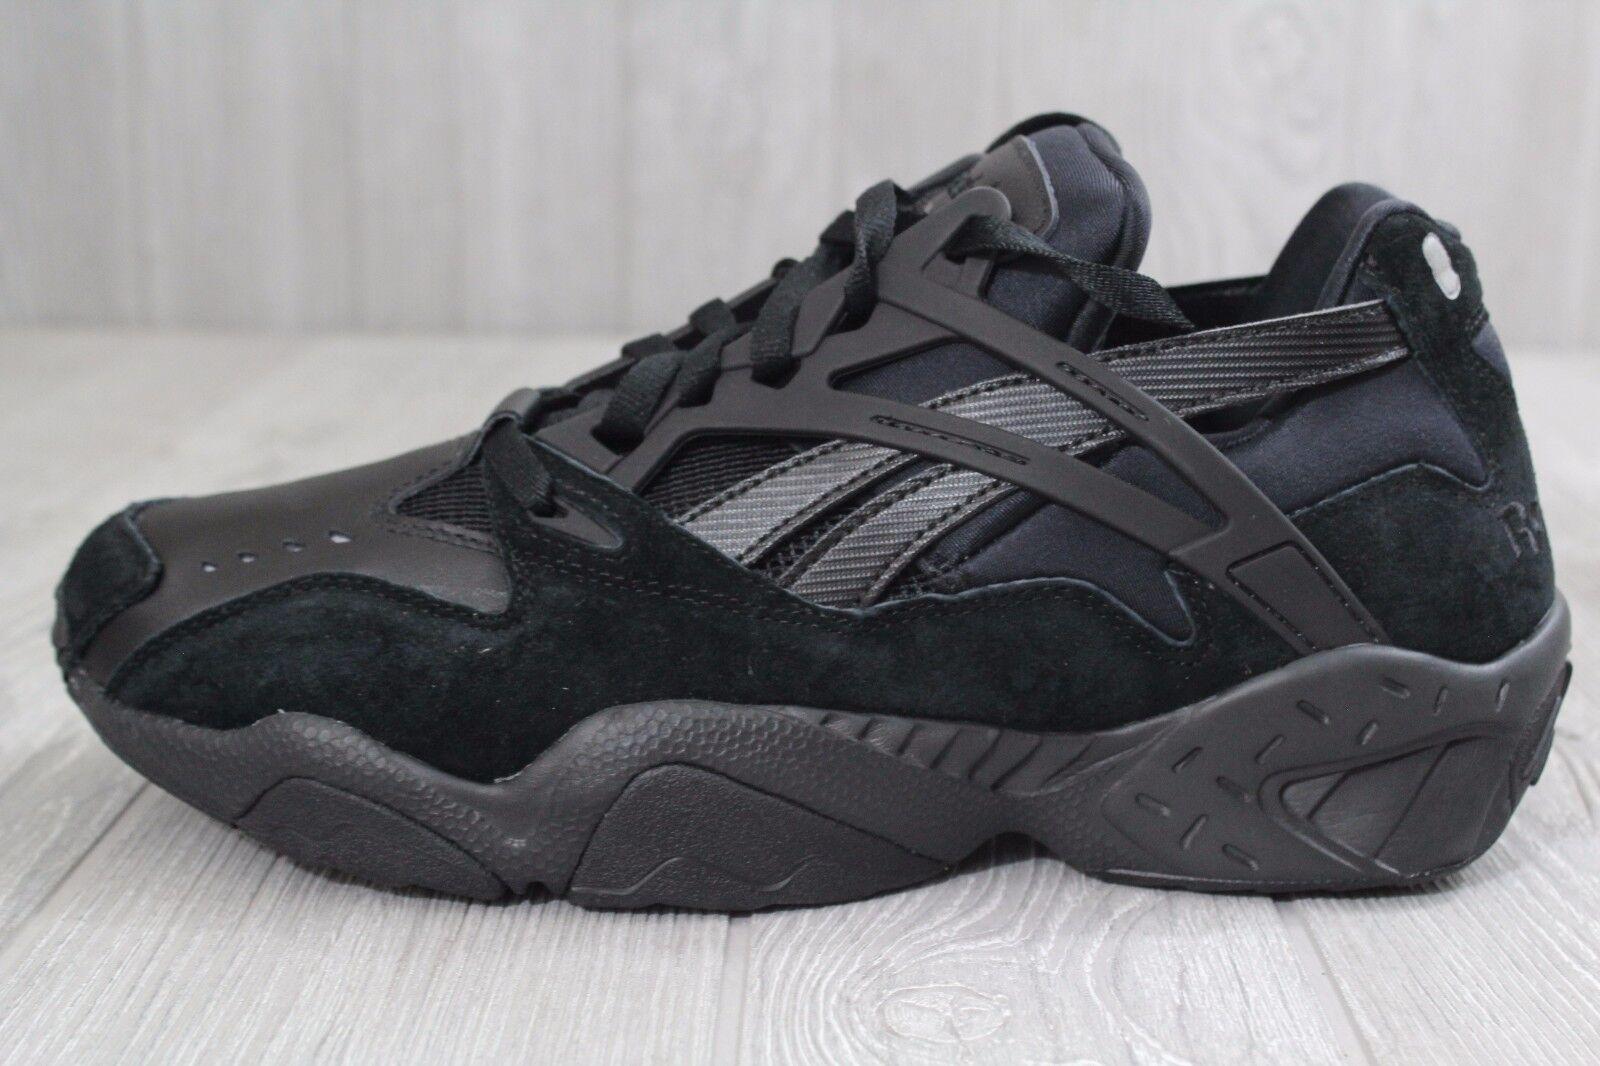 20 New Reebok Men's Sneakers  Graphlite Pro Solids  Black shoes AR1336 Size 10.5